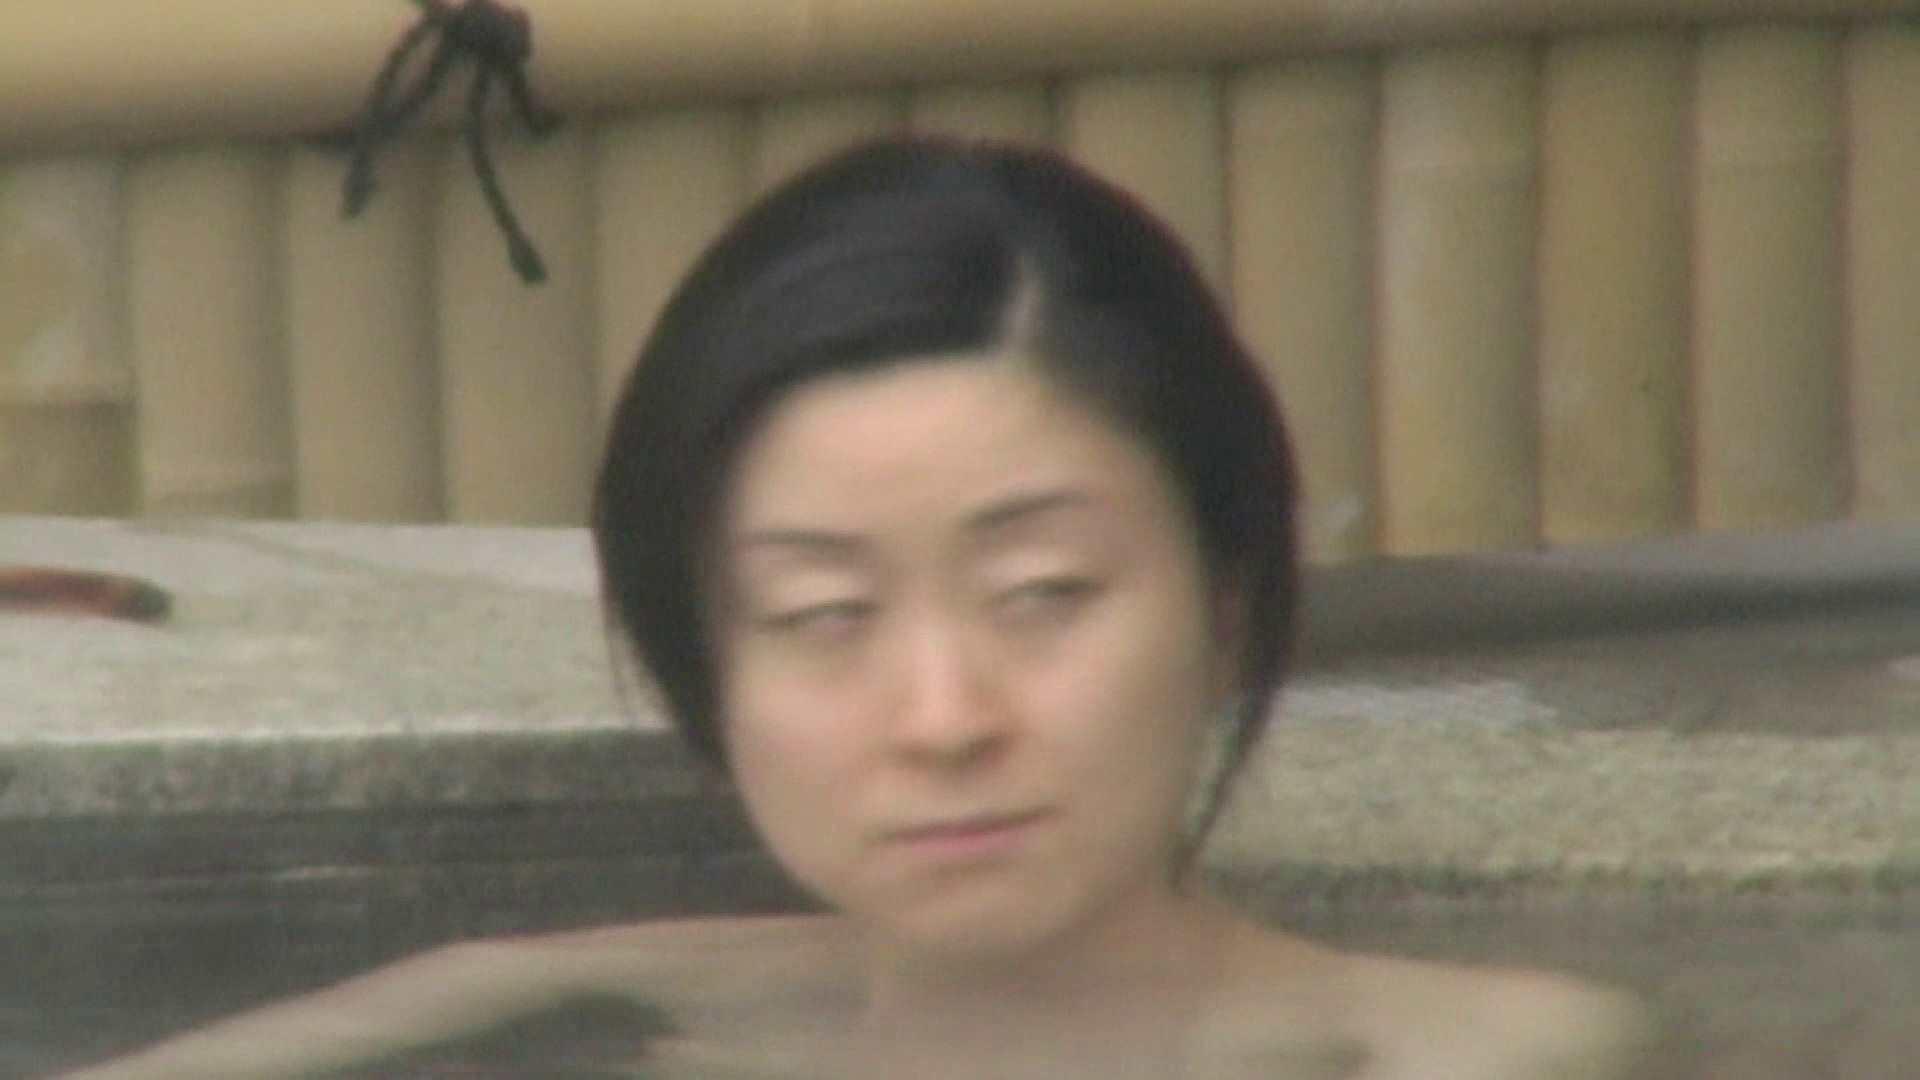 Aquaな露天風呂Vol.548 露天 覗きワレメ動画紹介 70連発 26